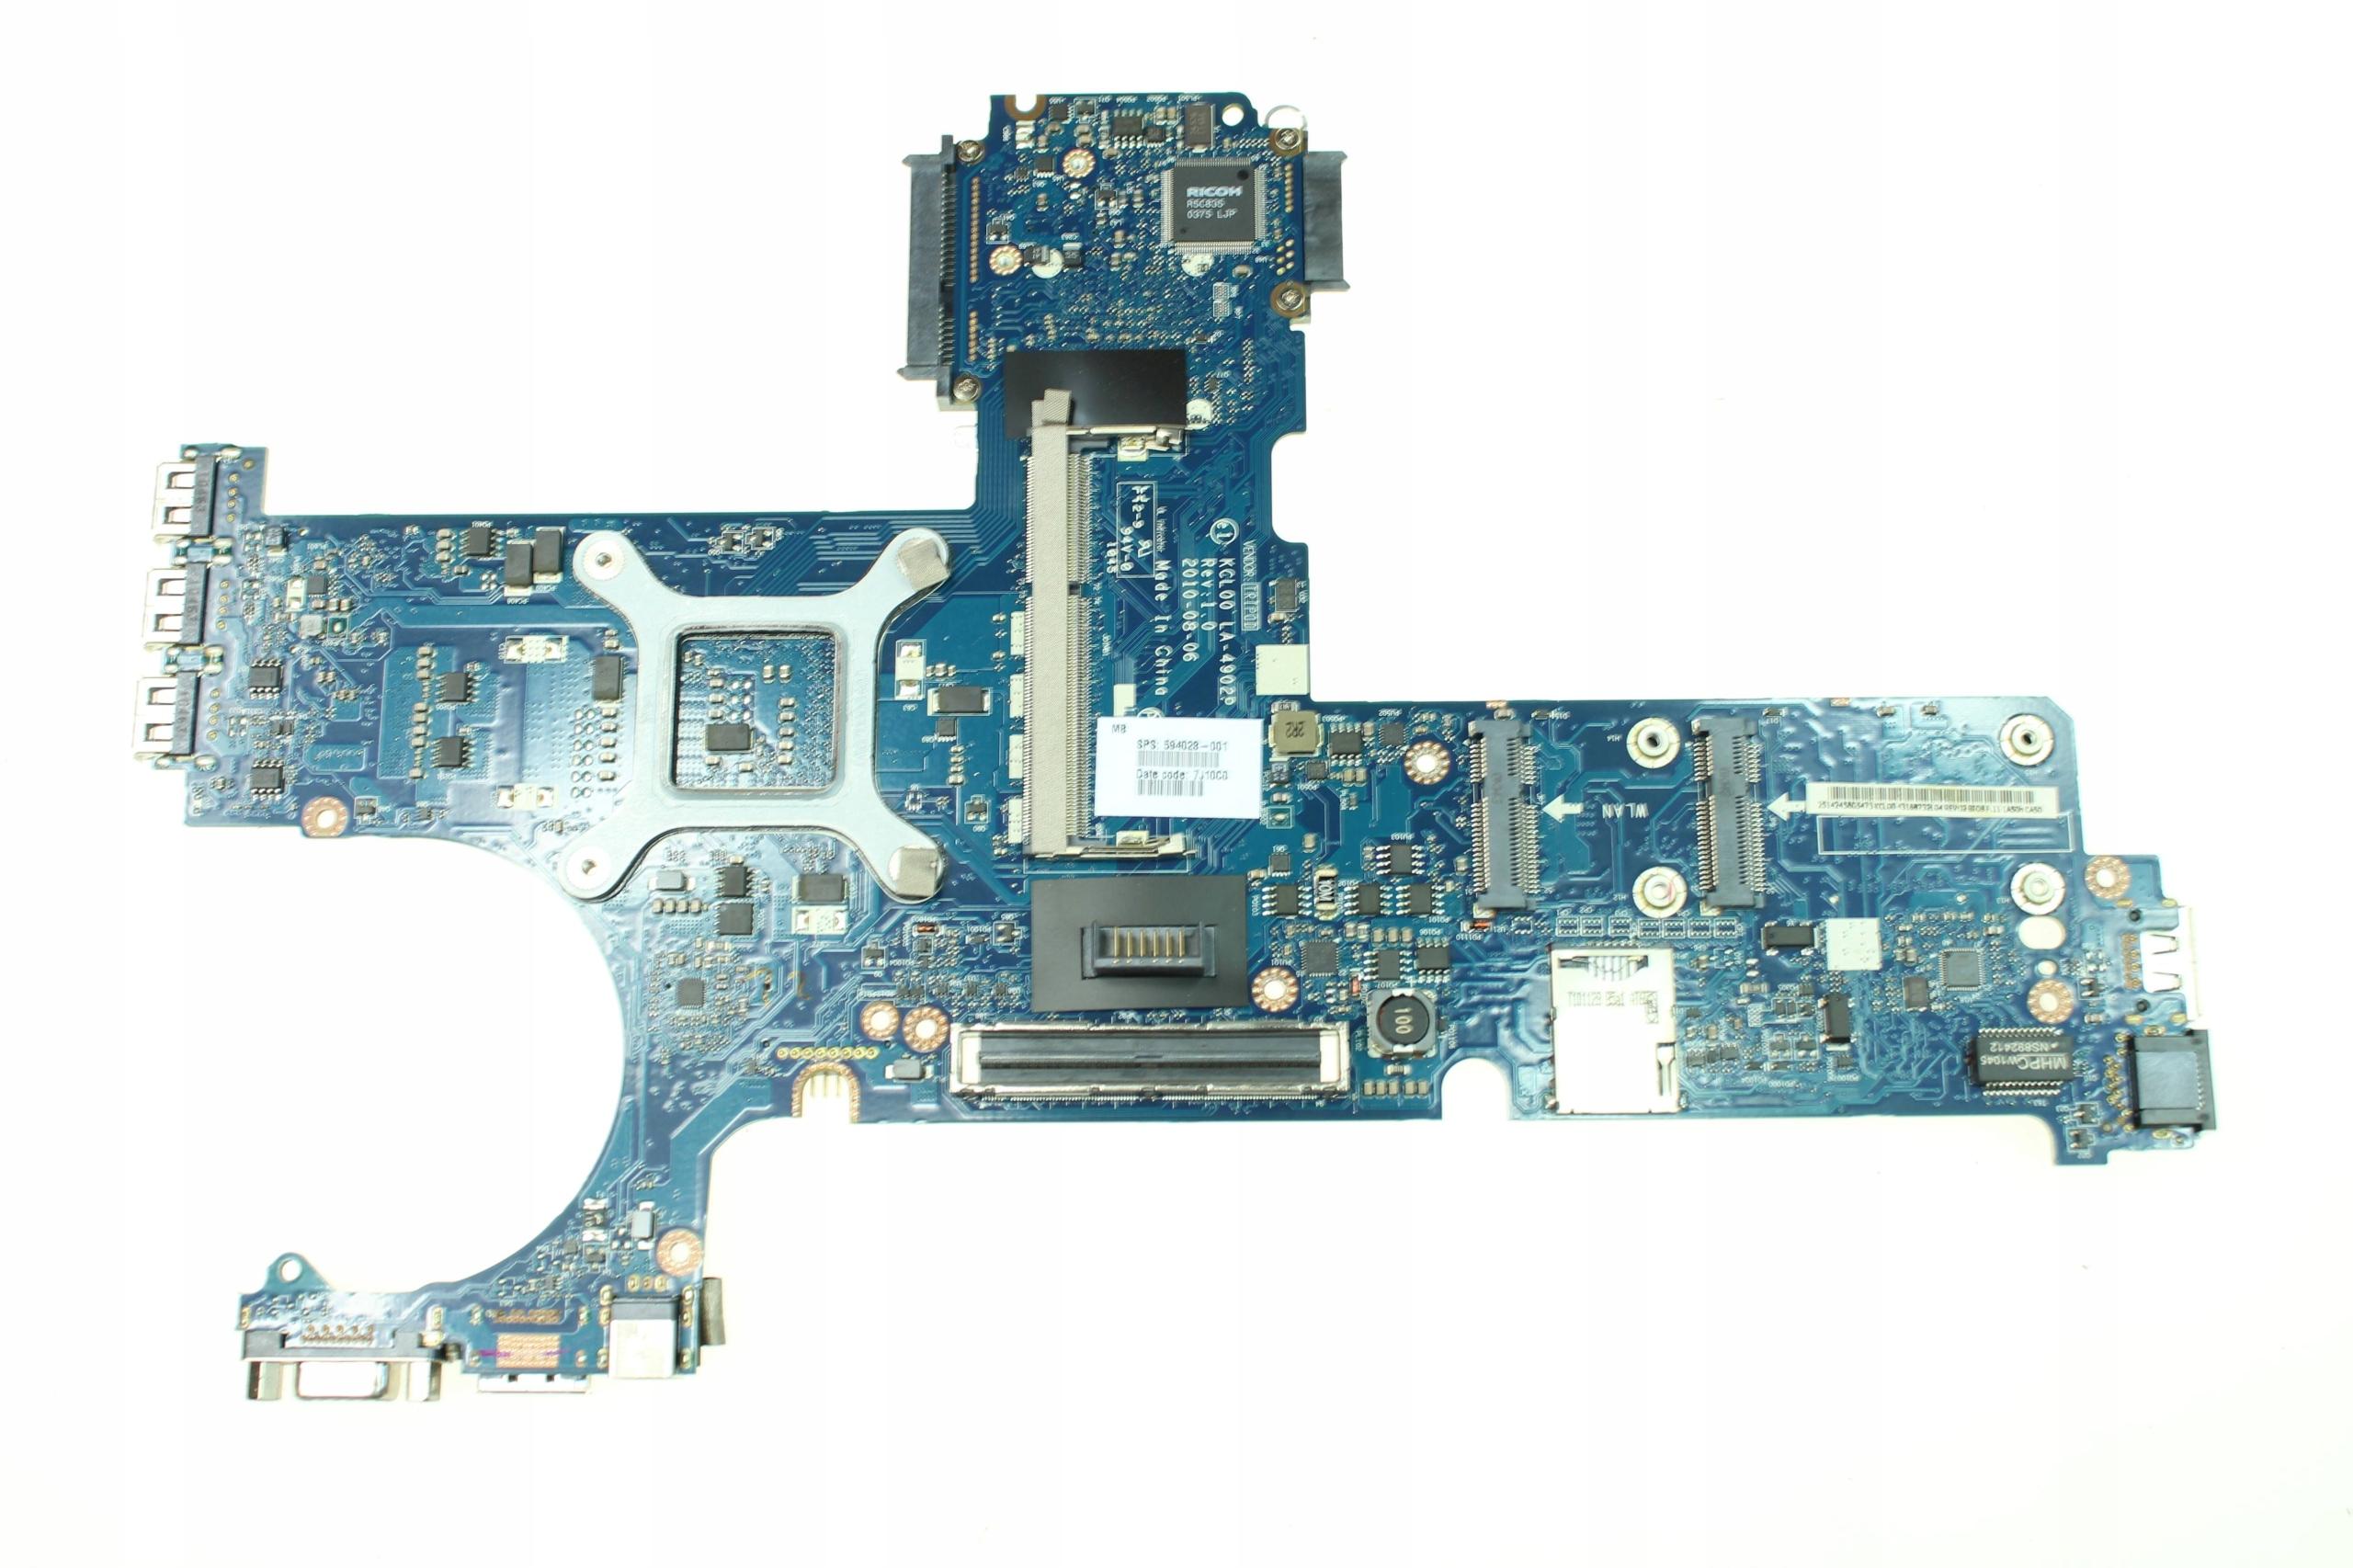 Płyta główna KCL00 LA-4902p HP EliteBook 8440p